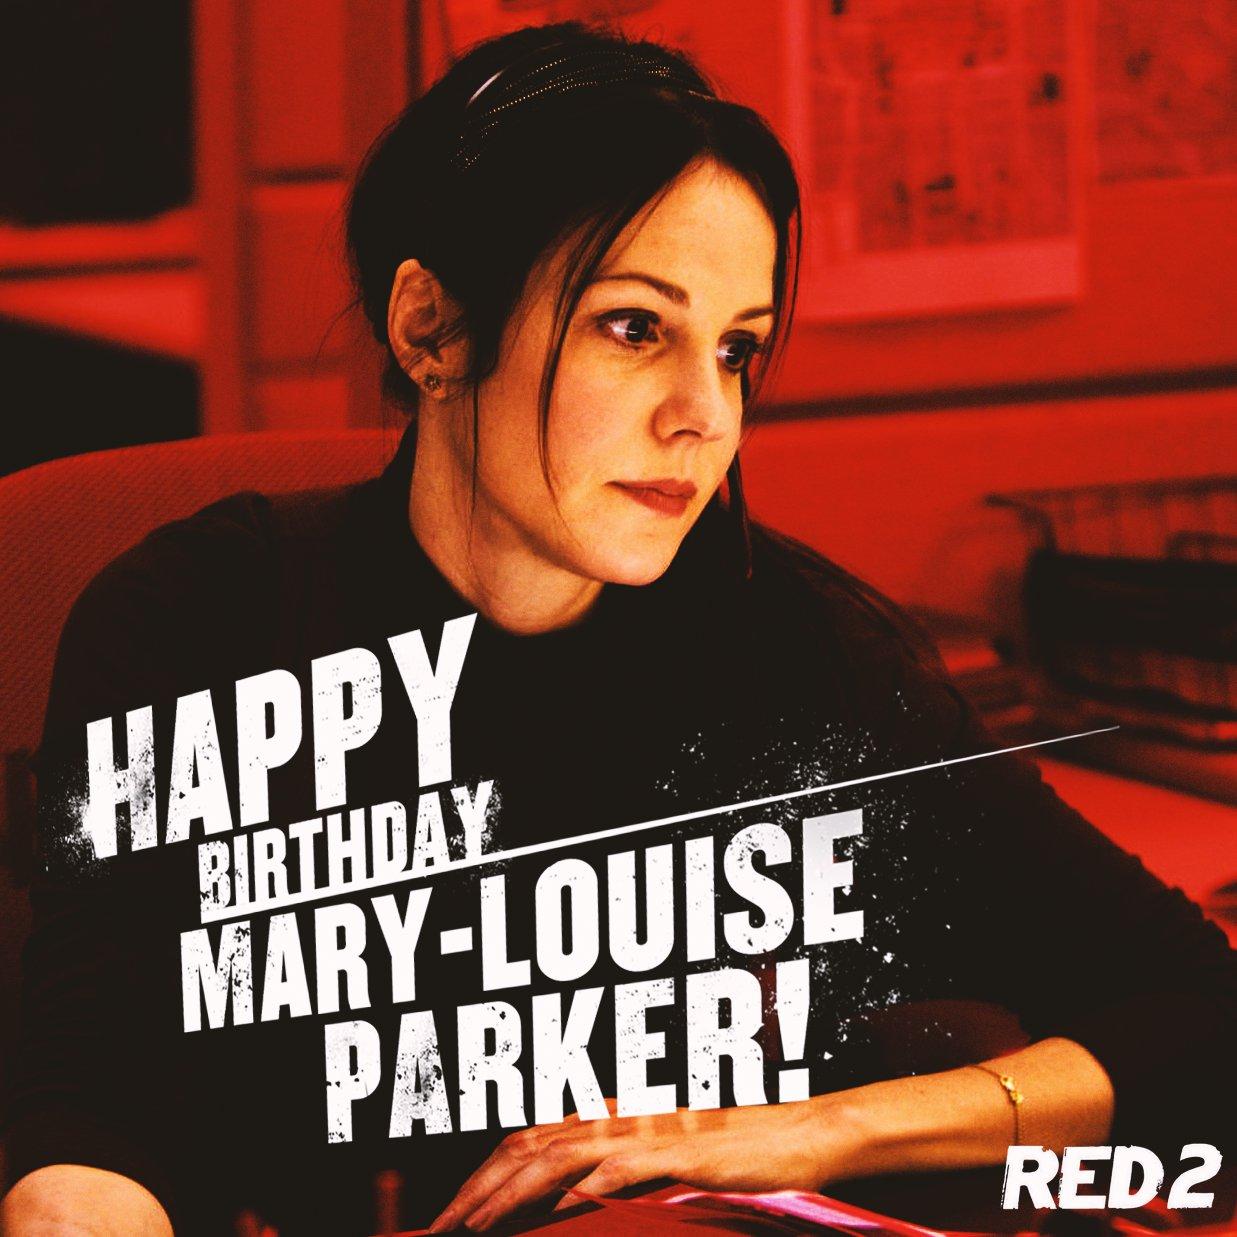 Happy Birthday Mary-Louise Parker!